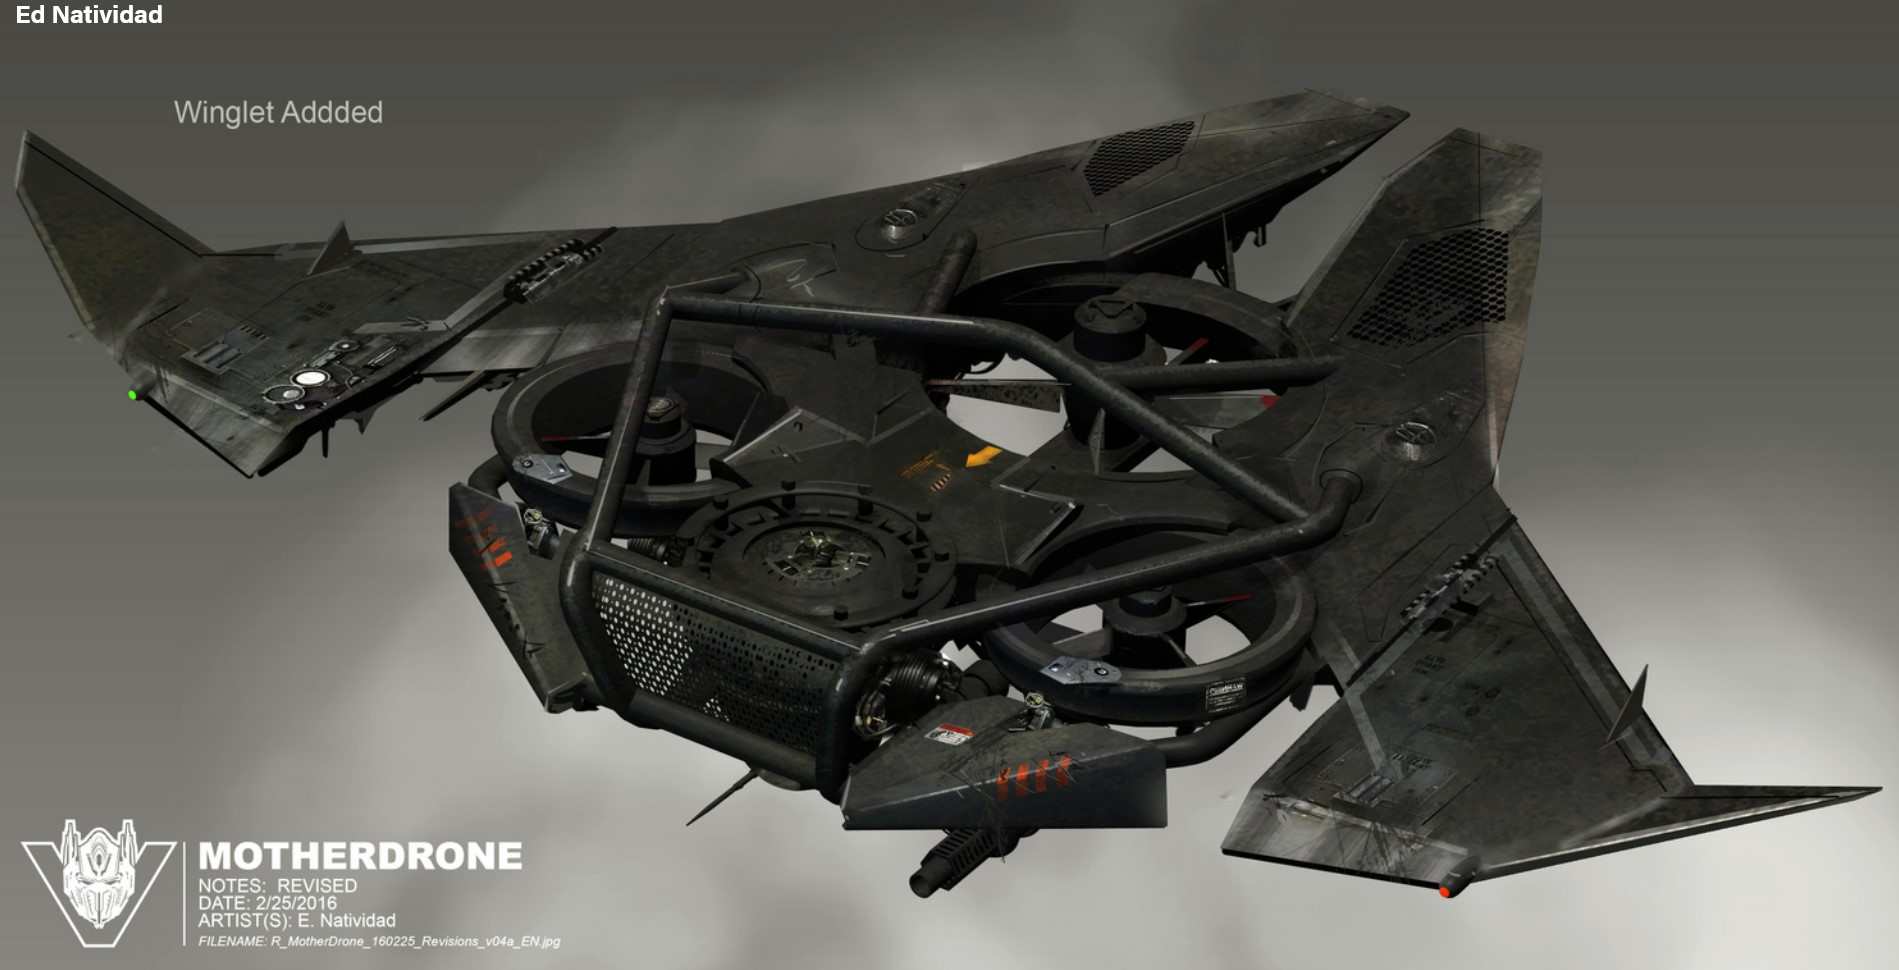 Transformers The Last Knight Concept Art By Ed Natividad